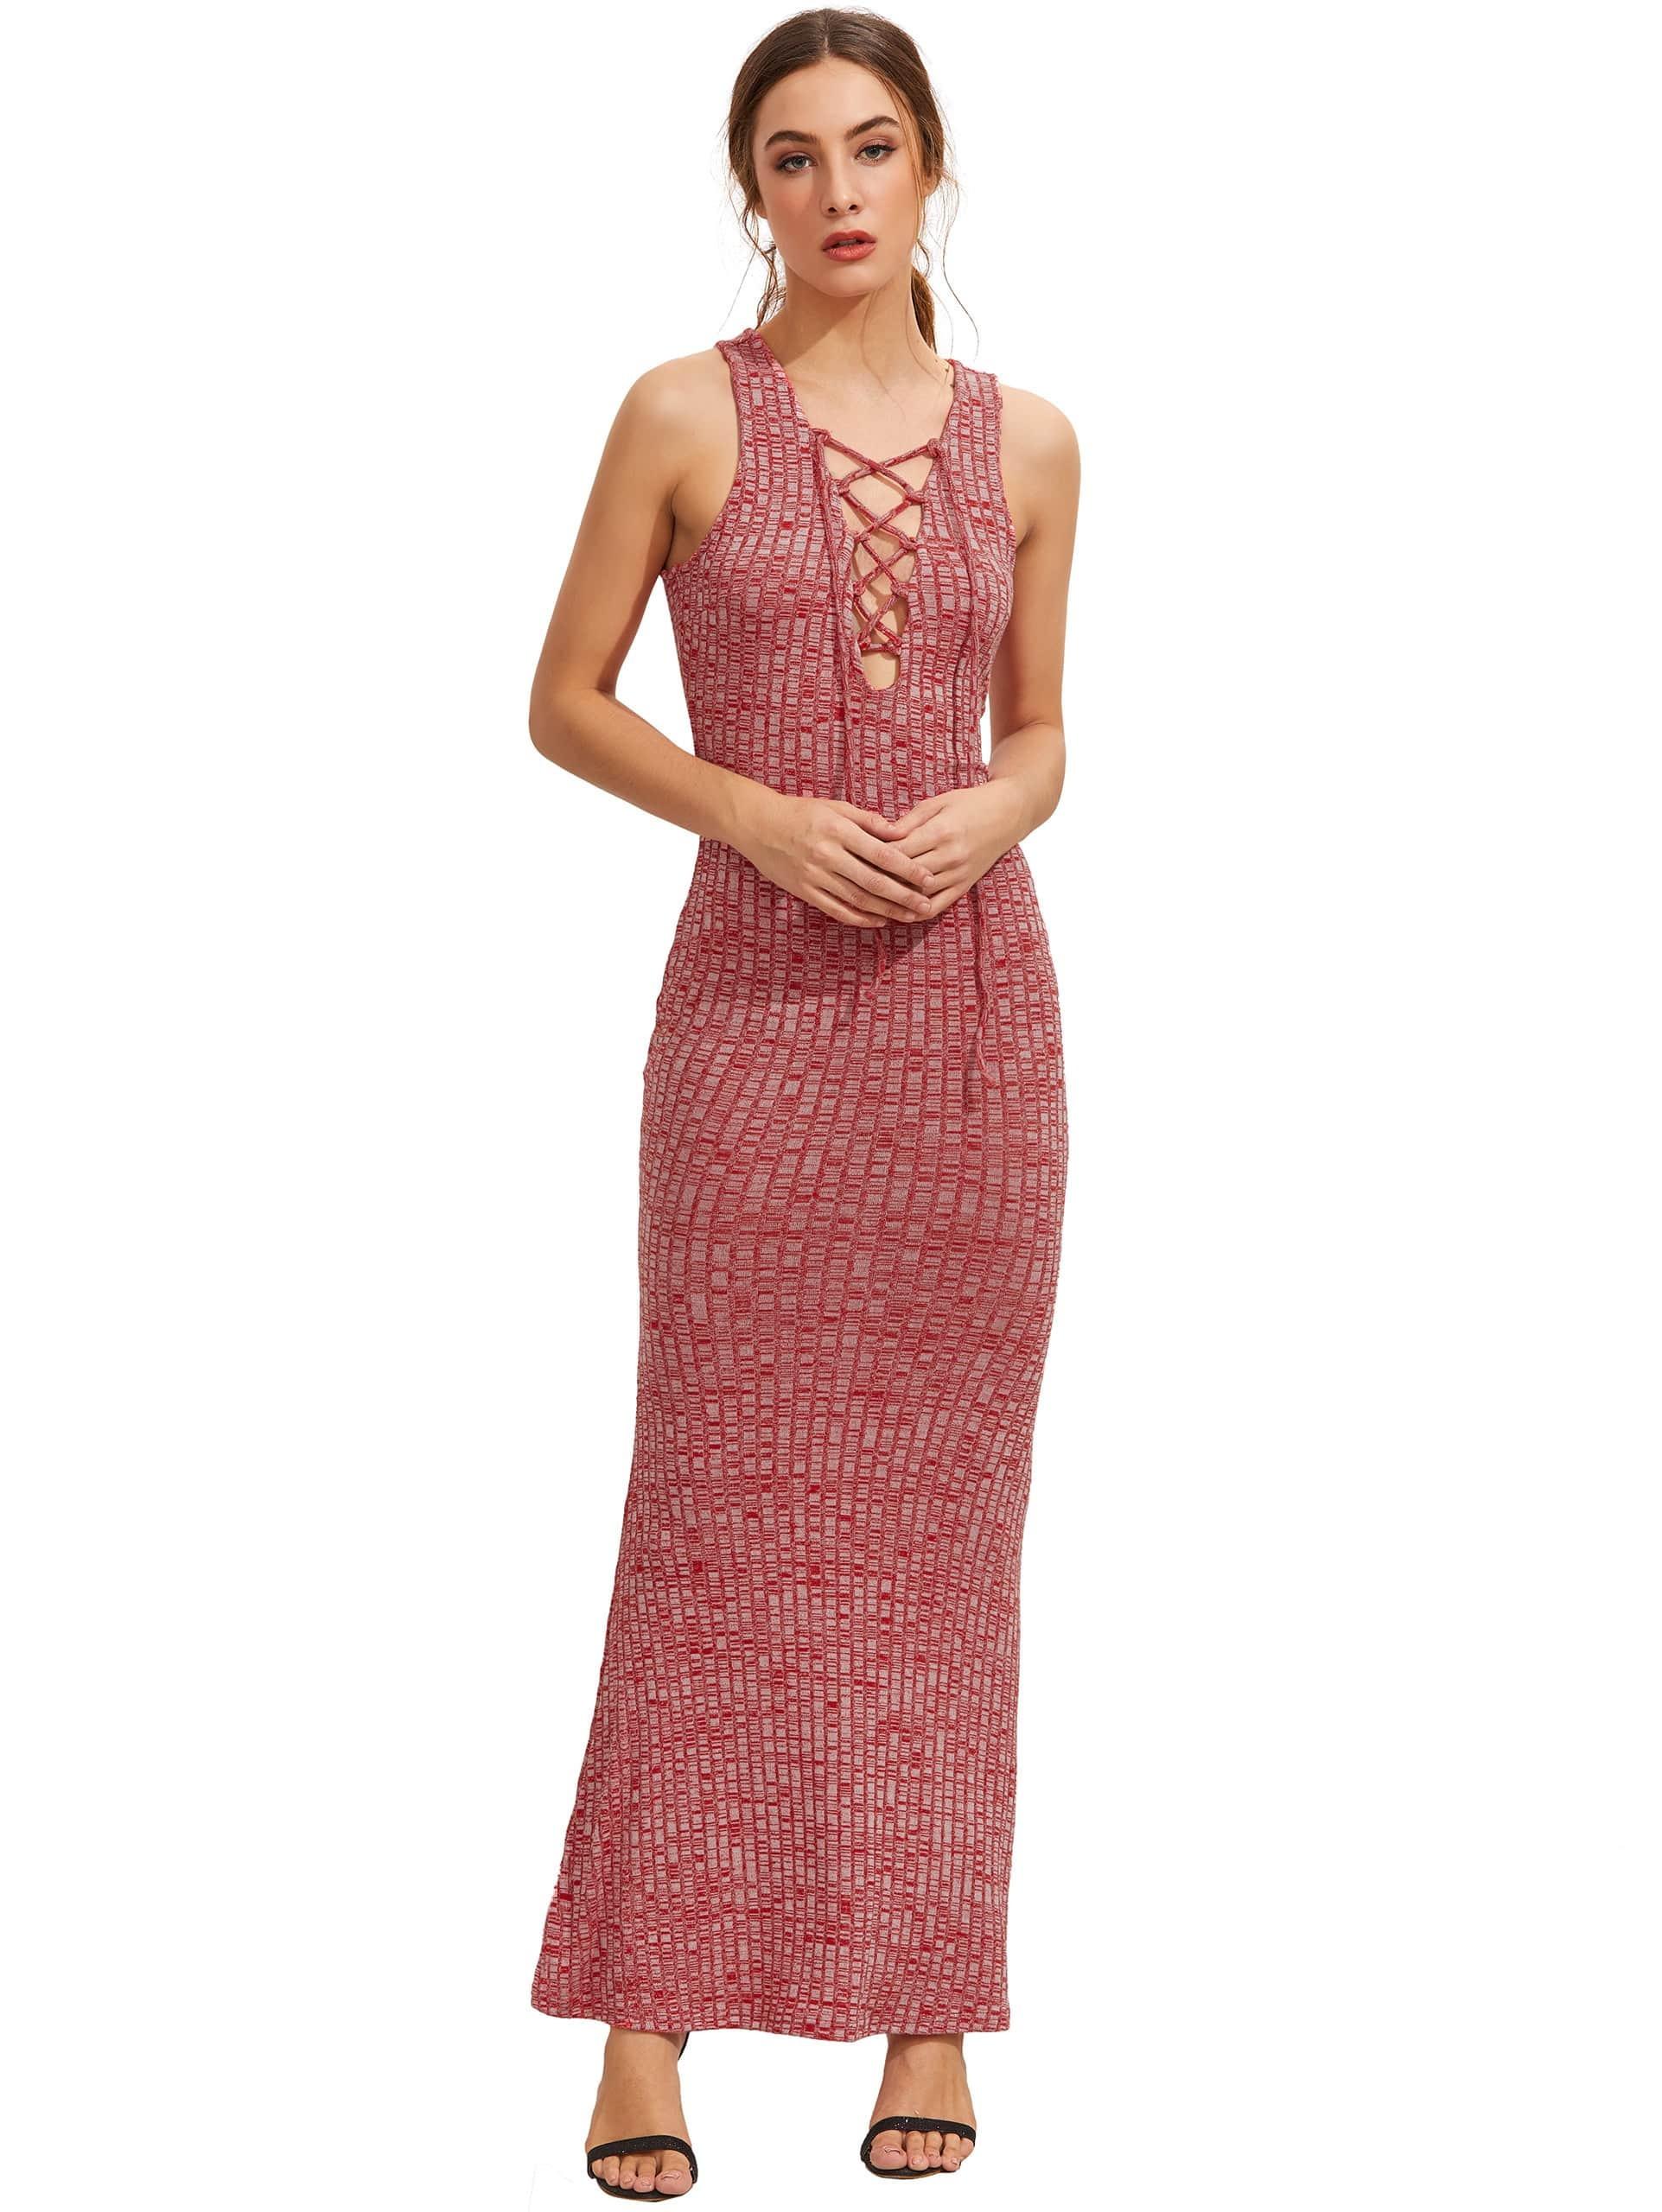 Lace Up Ribbed Maxi Dress